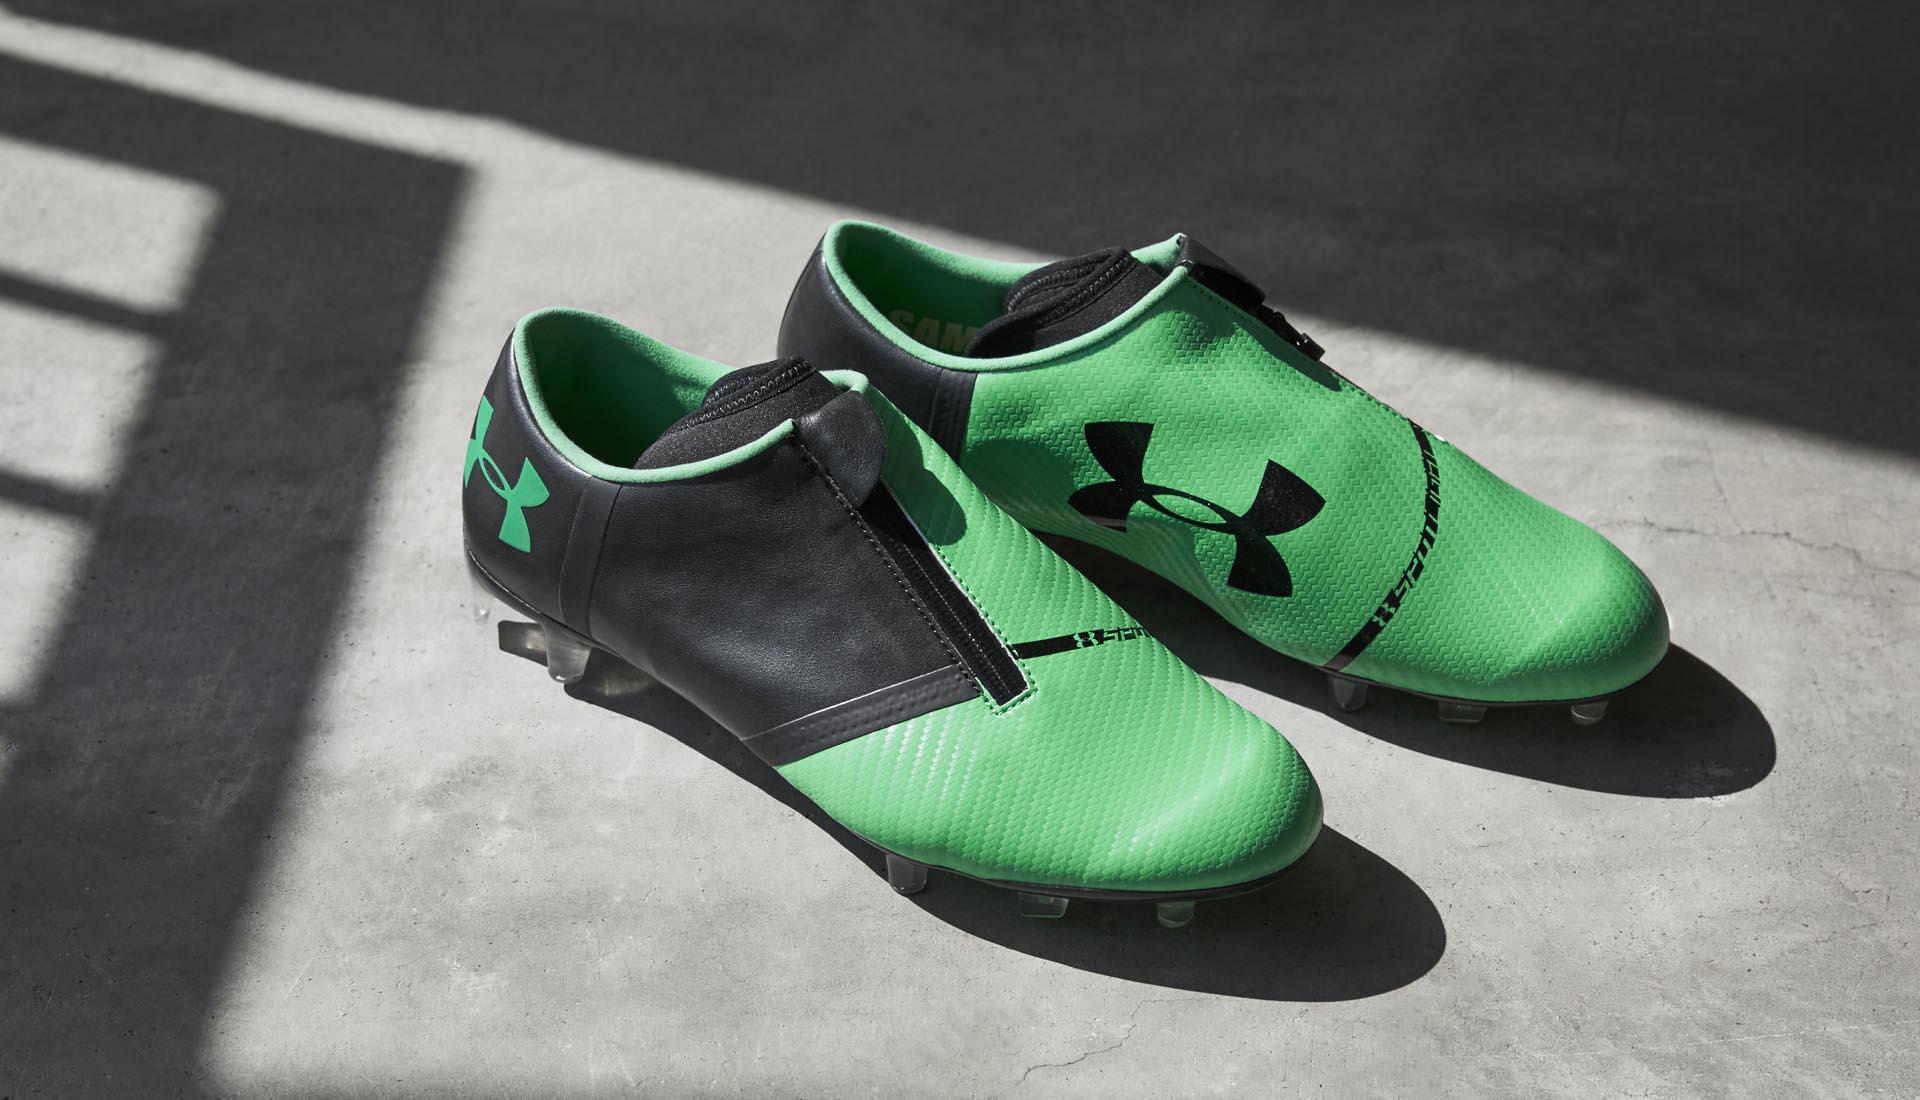 cheap under armour football boots